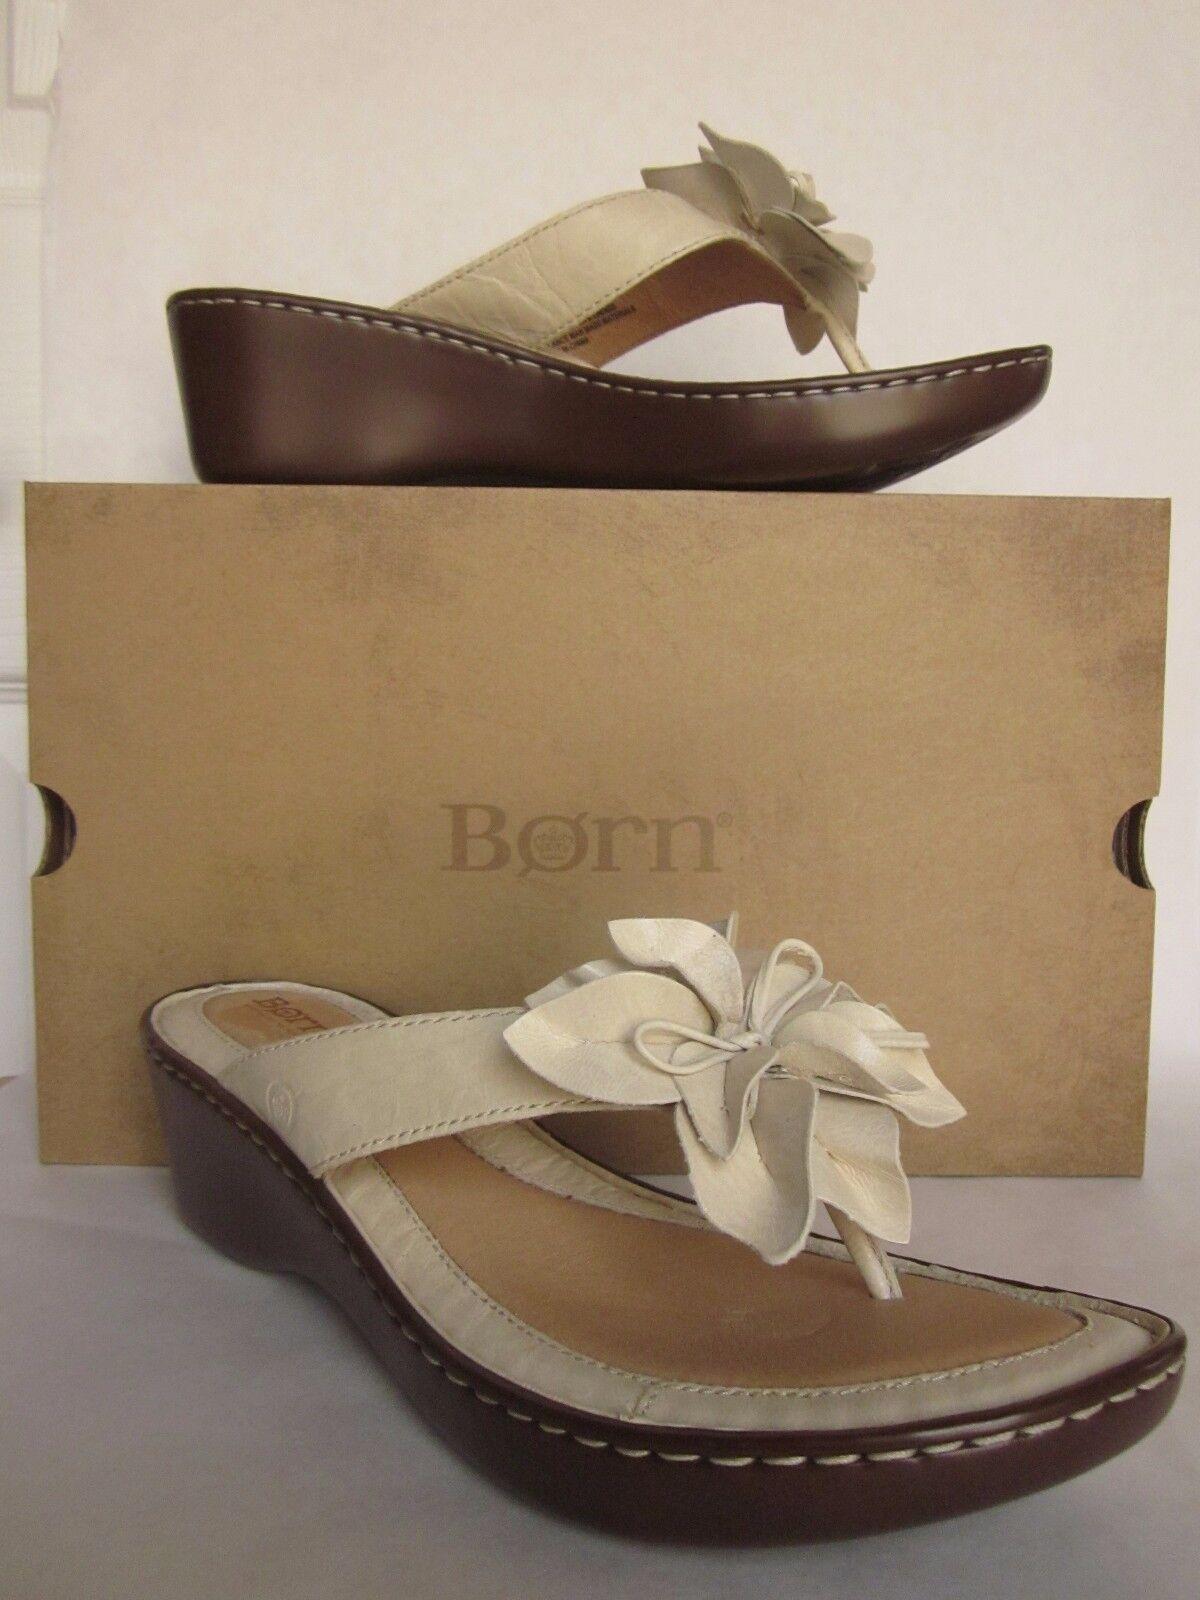 Born Shimmy Off White Wedge Flower Sandal - size 11